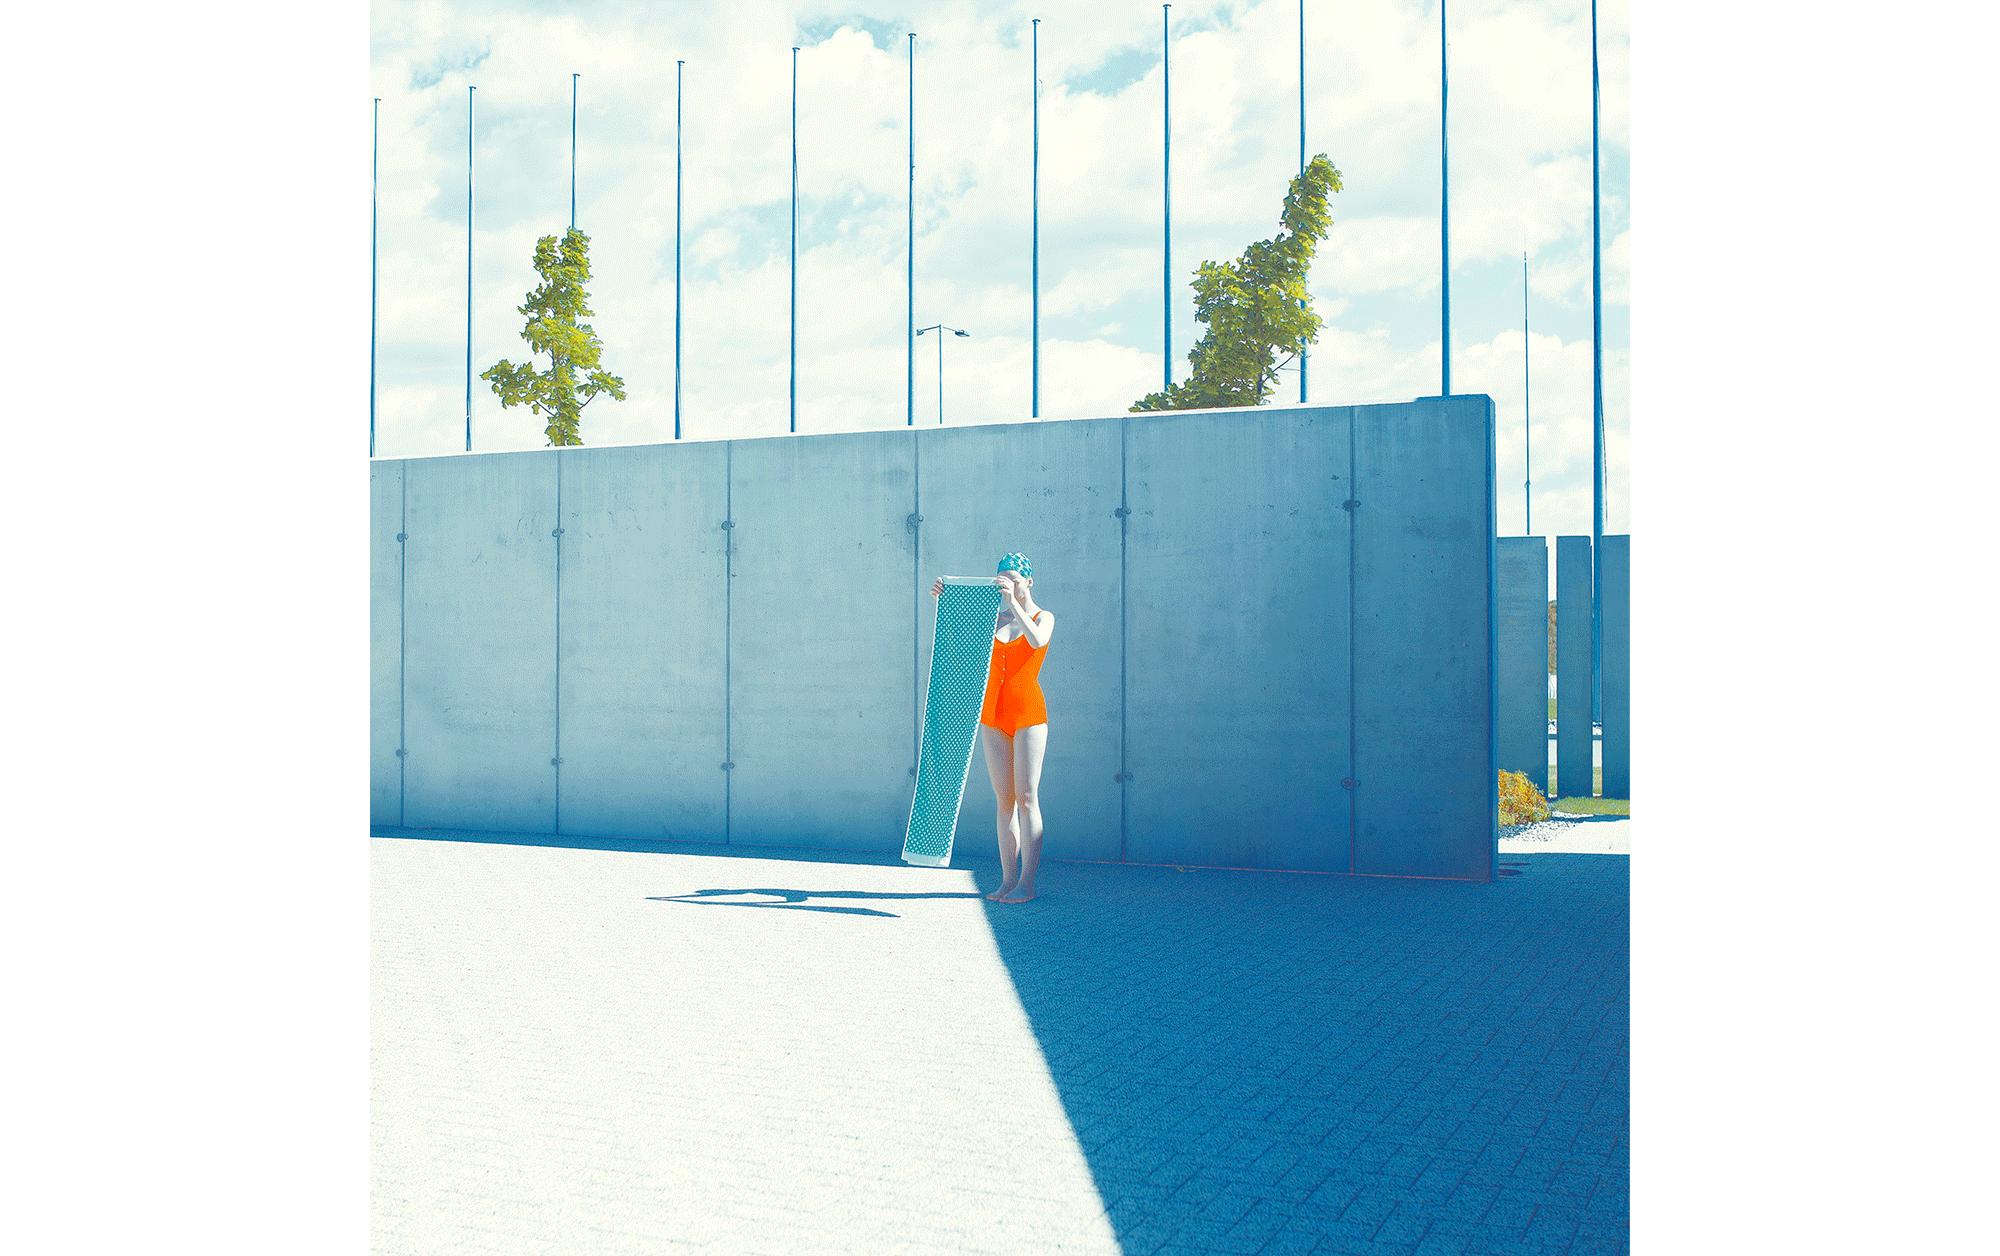 Trees, The Tribune, 2016 © Maria Svarbova